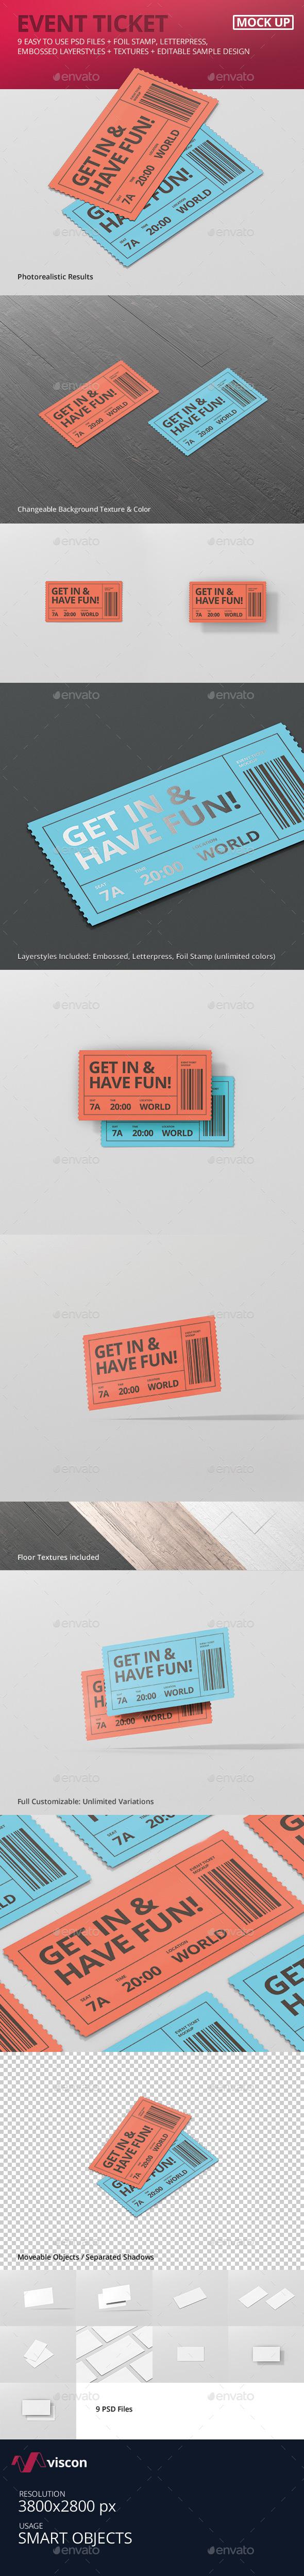 Event Ticket Mockup - Miscellaneous Print